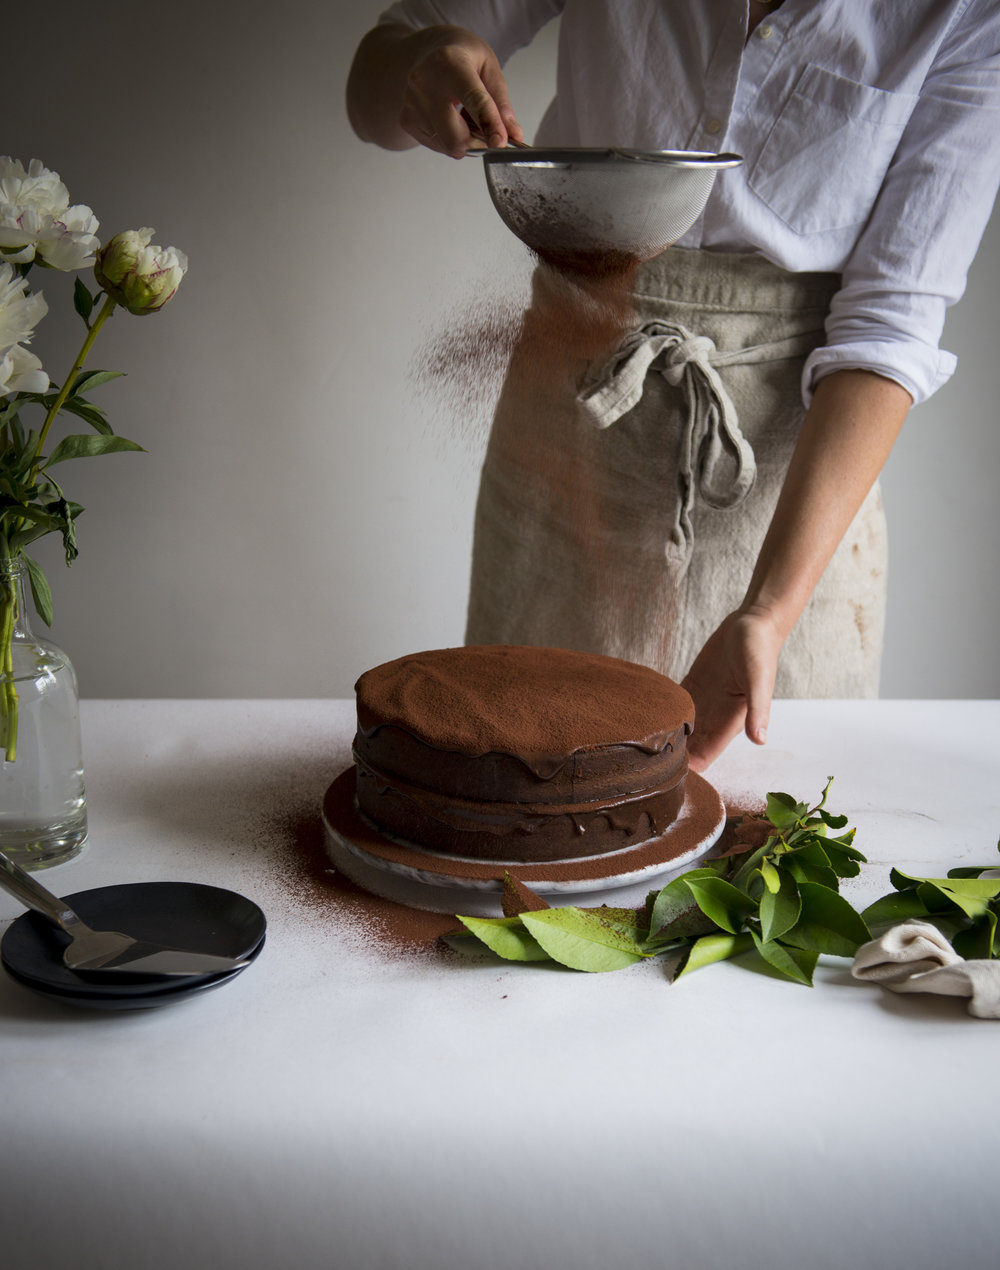 chocolatecake-jordan-1.jpg